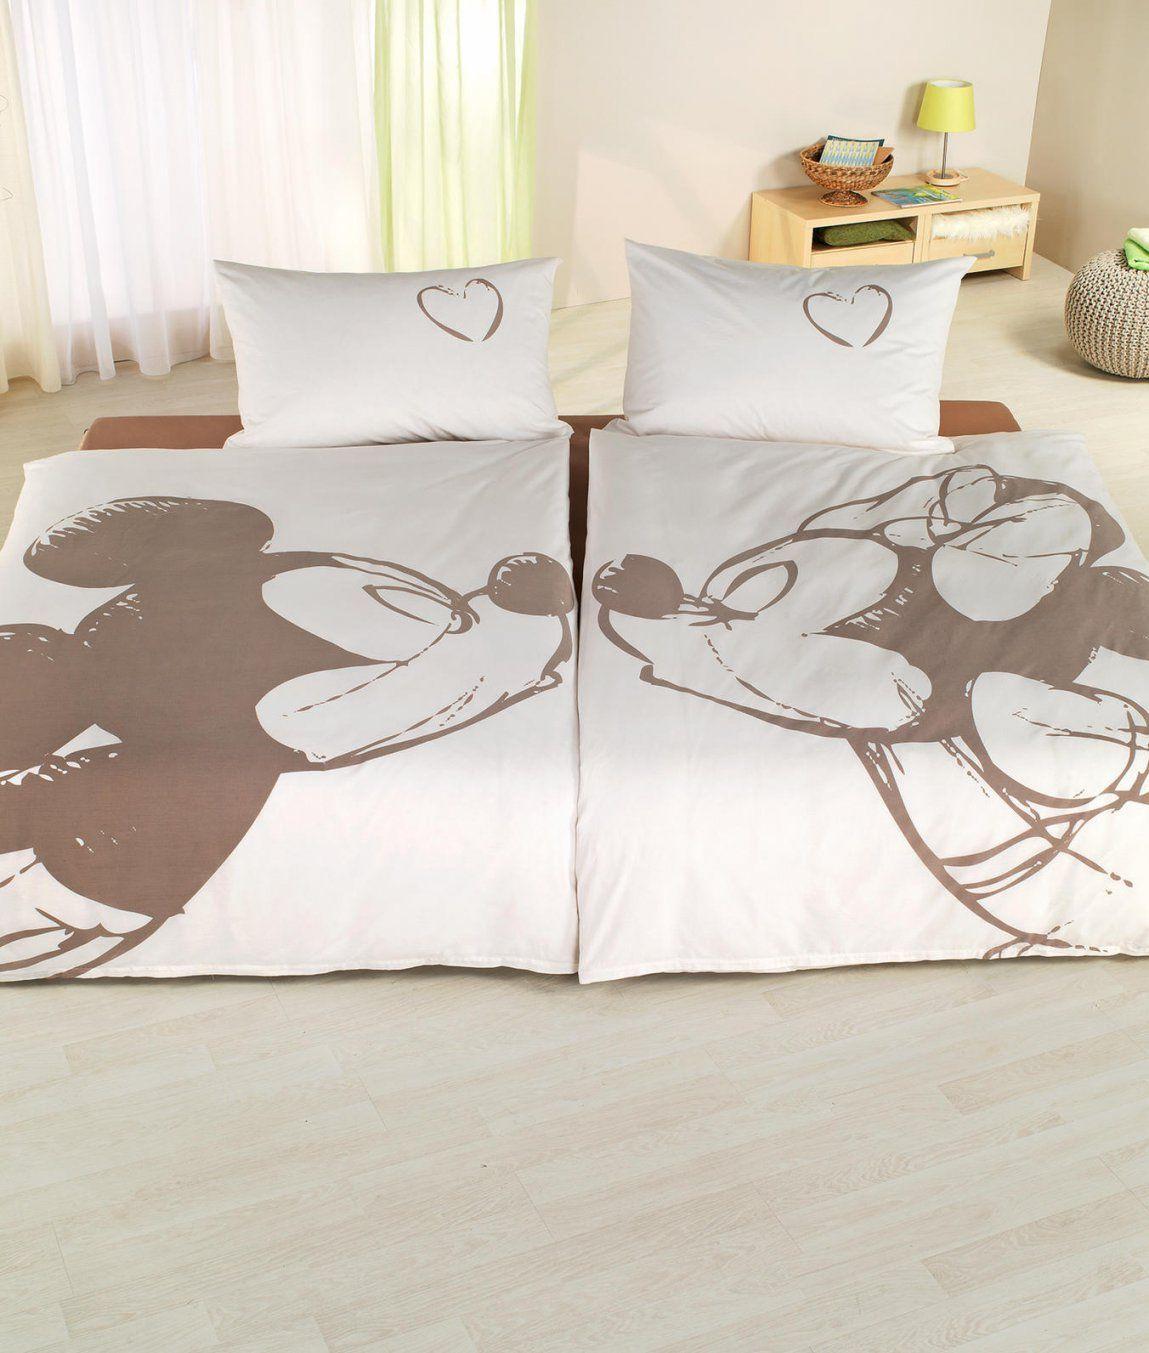 Mickey Mouse Partnerbettwäsche Im 2Erset Kaufen  Angela Bruderer von Mickey Mouse Bettwäsche Bild